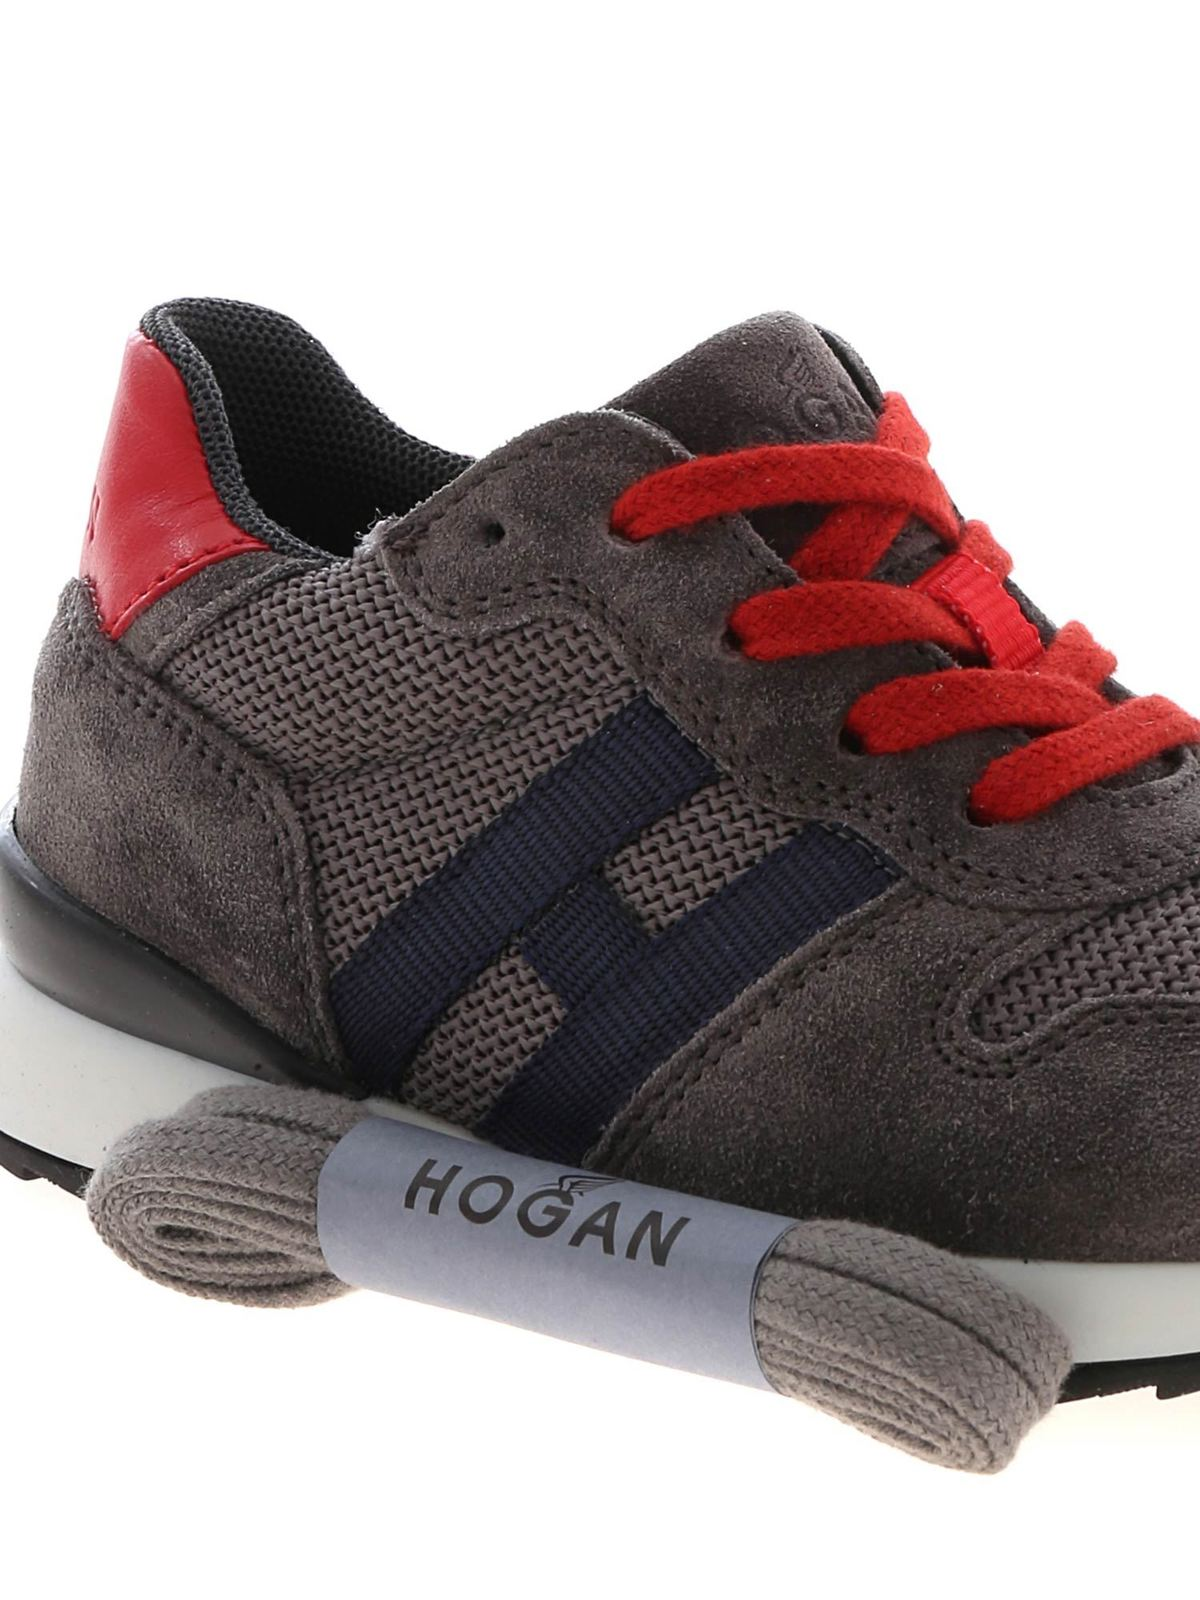 Hogan Junior - R261 sneakers in grey and red - اسپرت،اسنیکرز ...